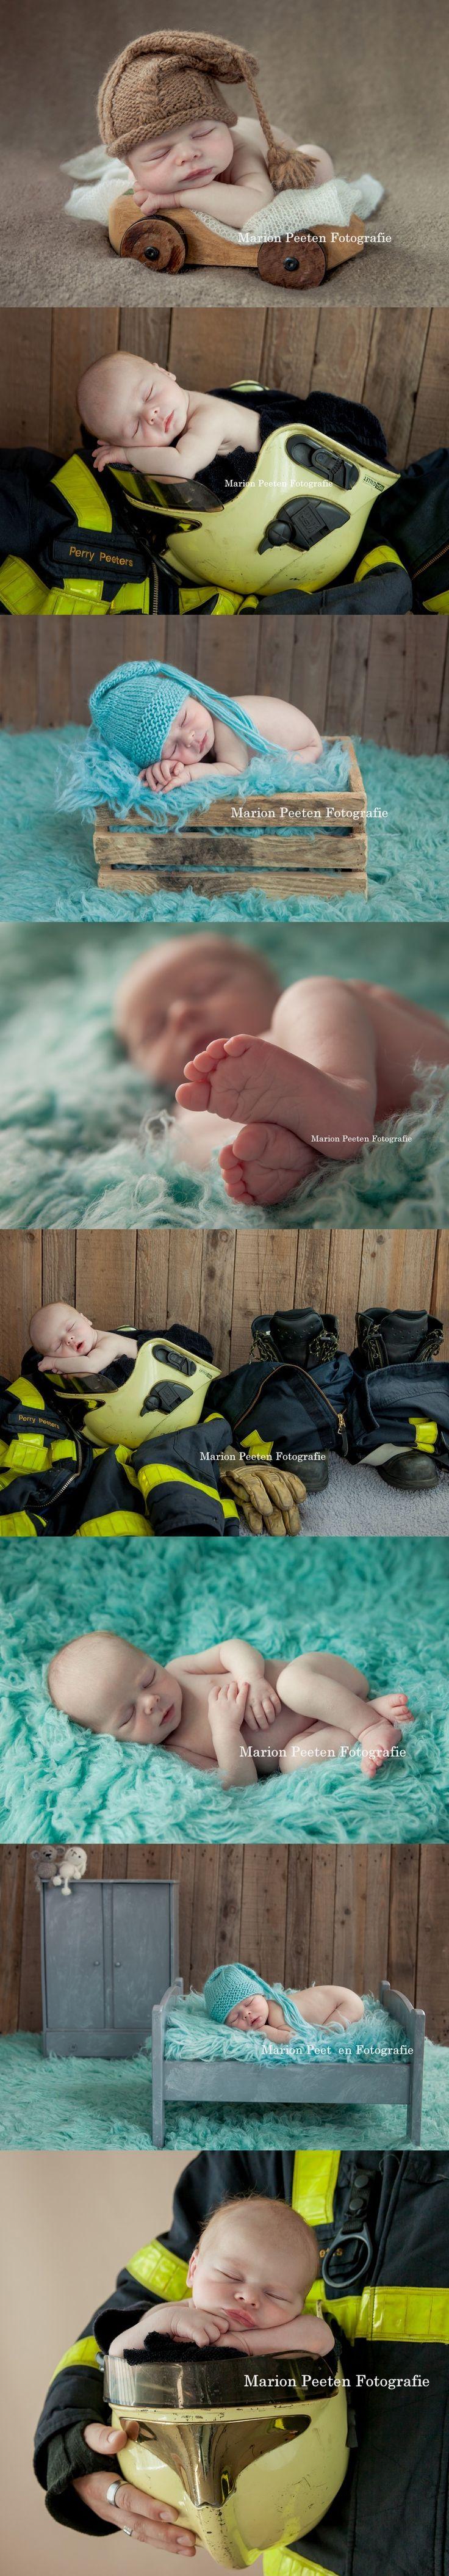 Marion Peeten Fotografie#Newborn fotografie Maasbree# Newborn fotografie…